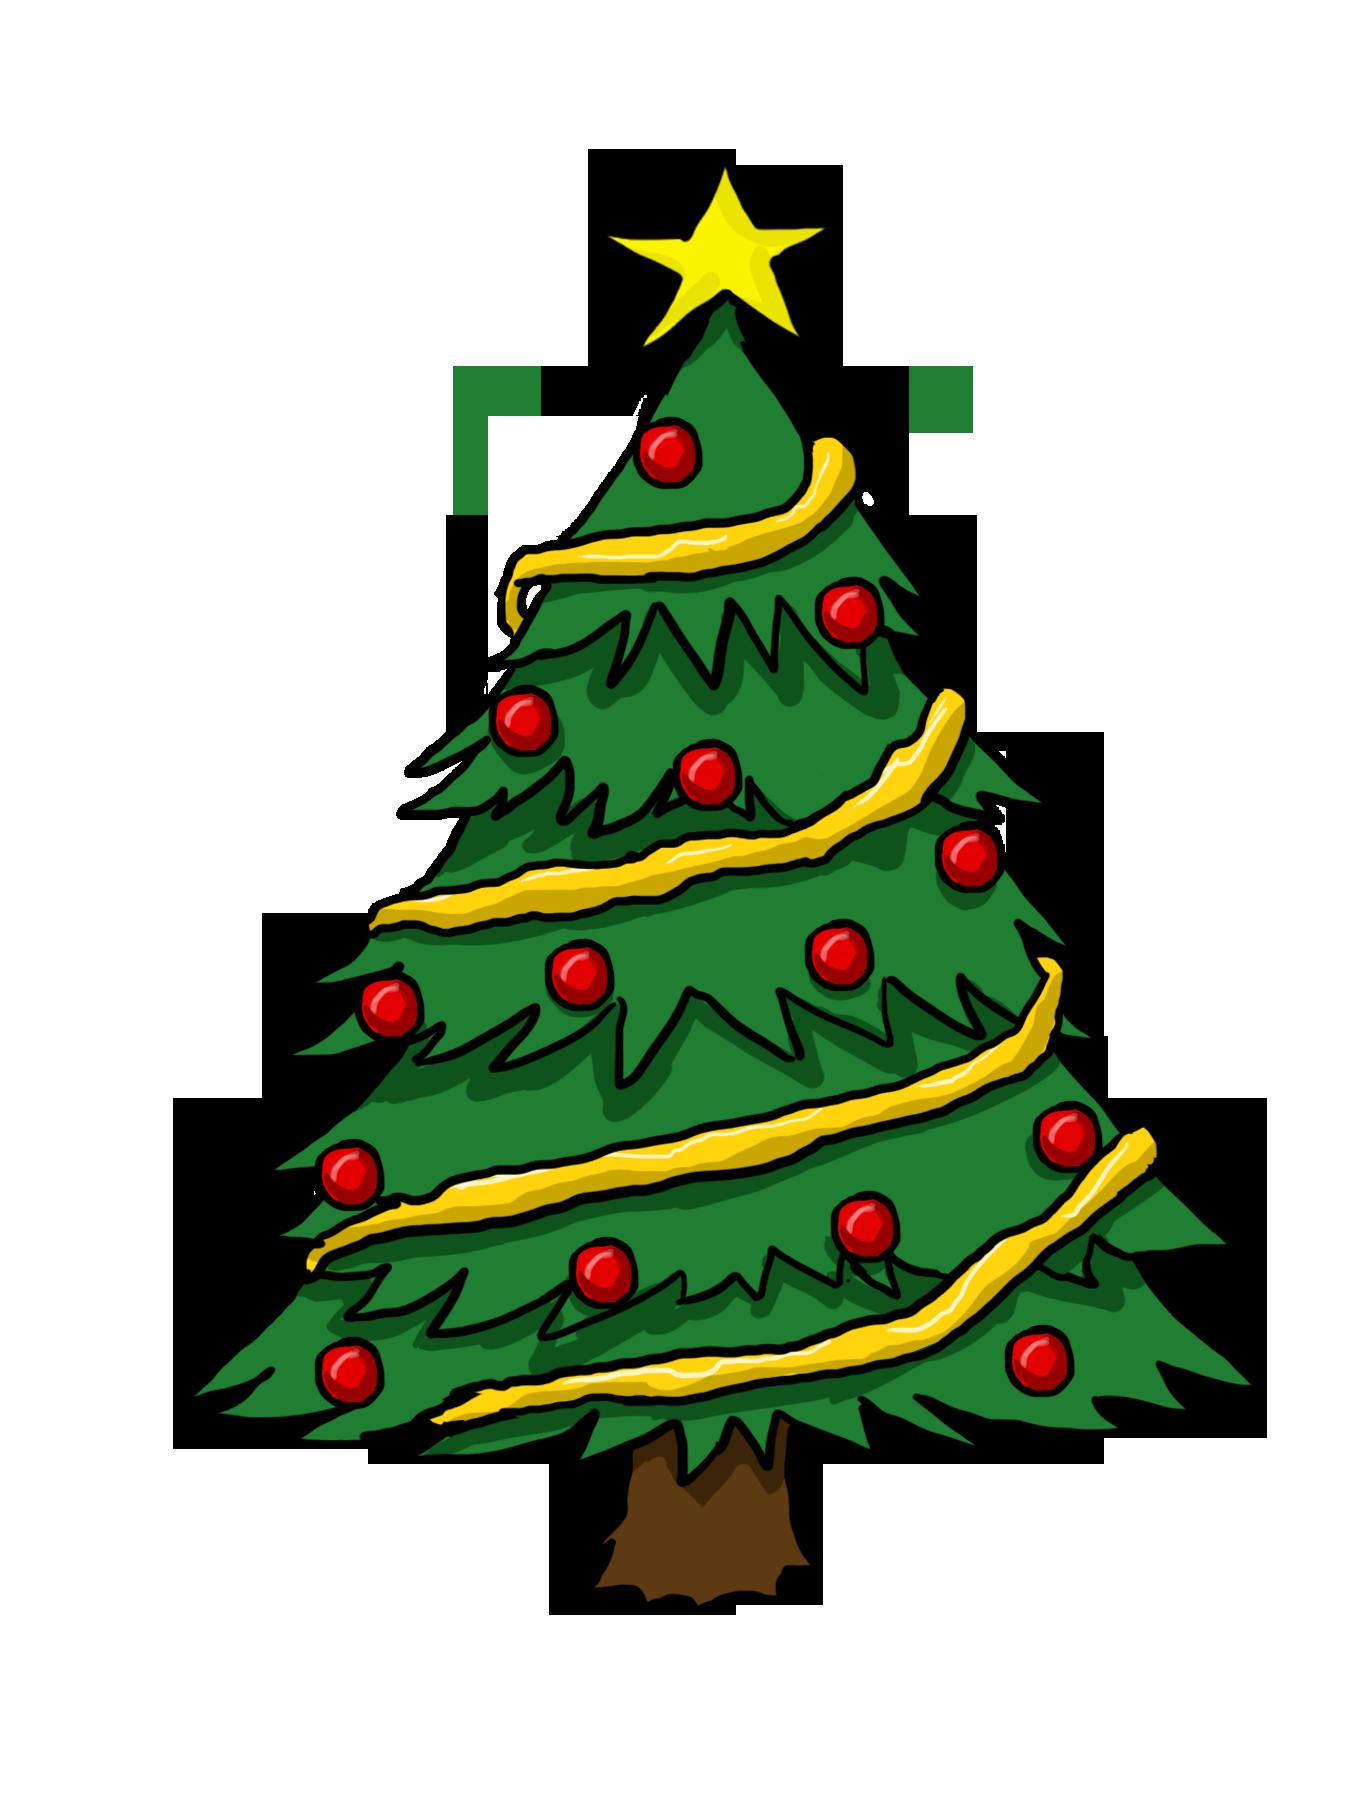 Christmas bazaar clipart jpg freeuse download Christmas Bazaar Vendor Tables   Blessed Sacrament School jpg freeuse download